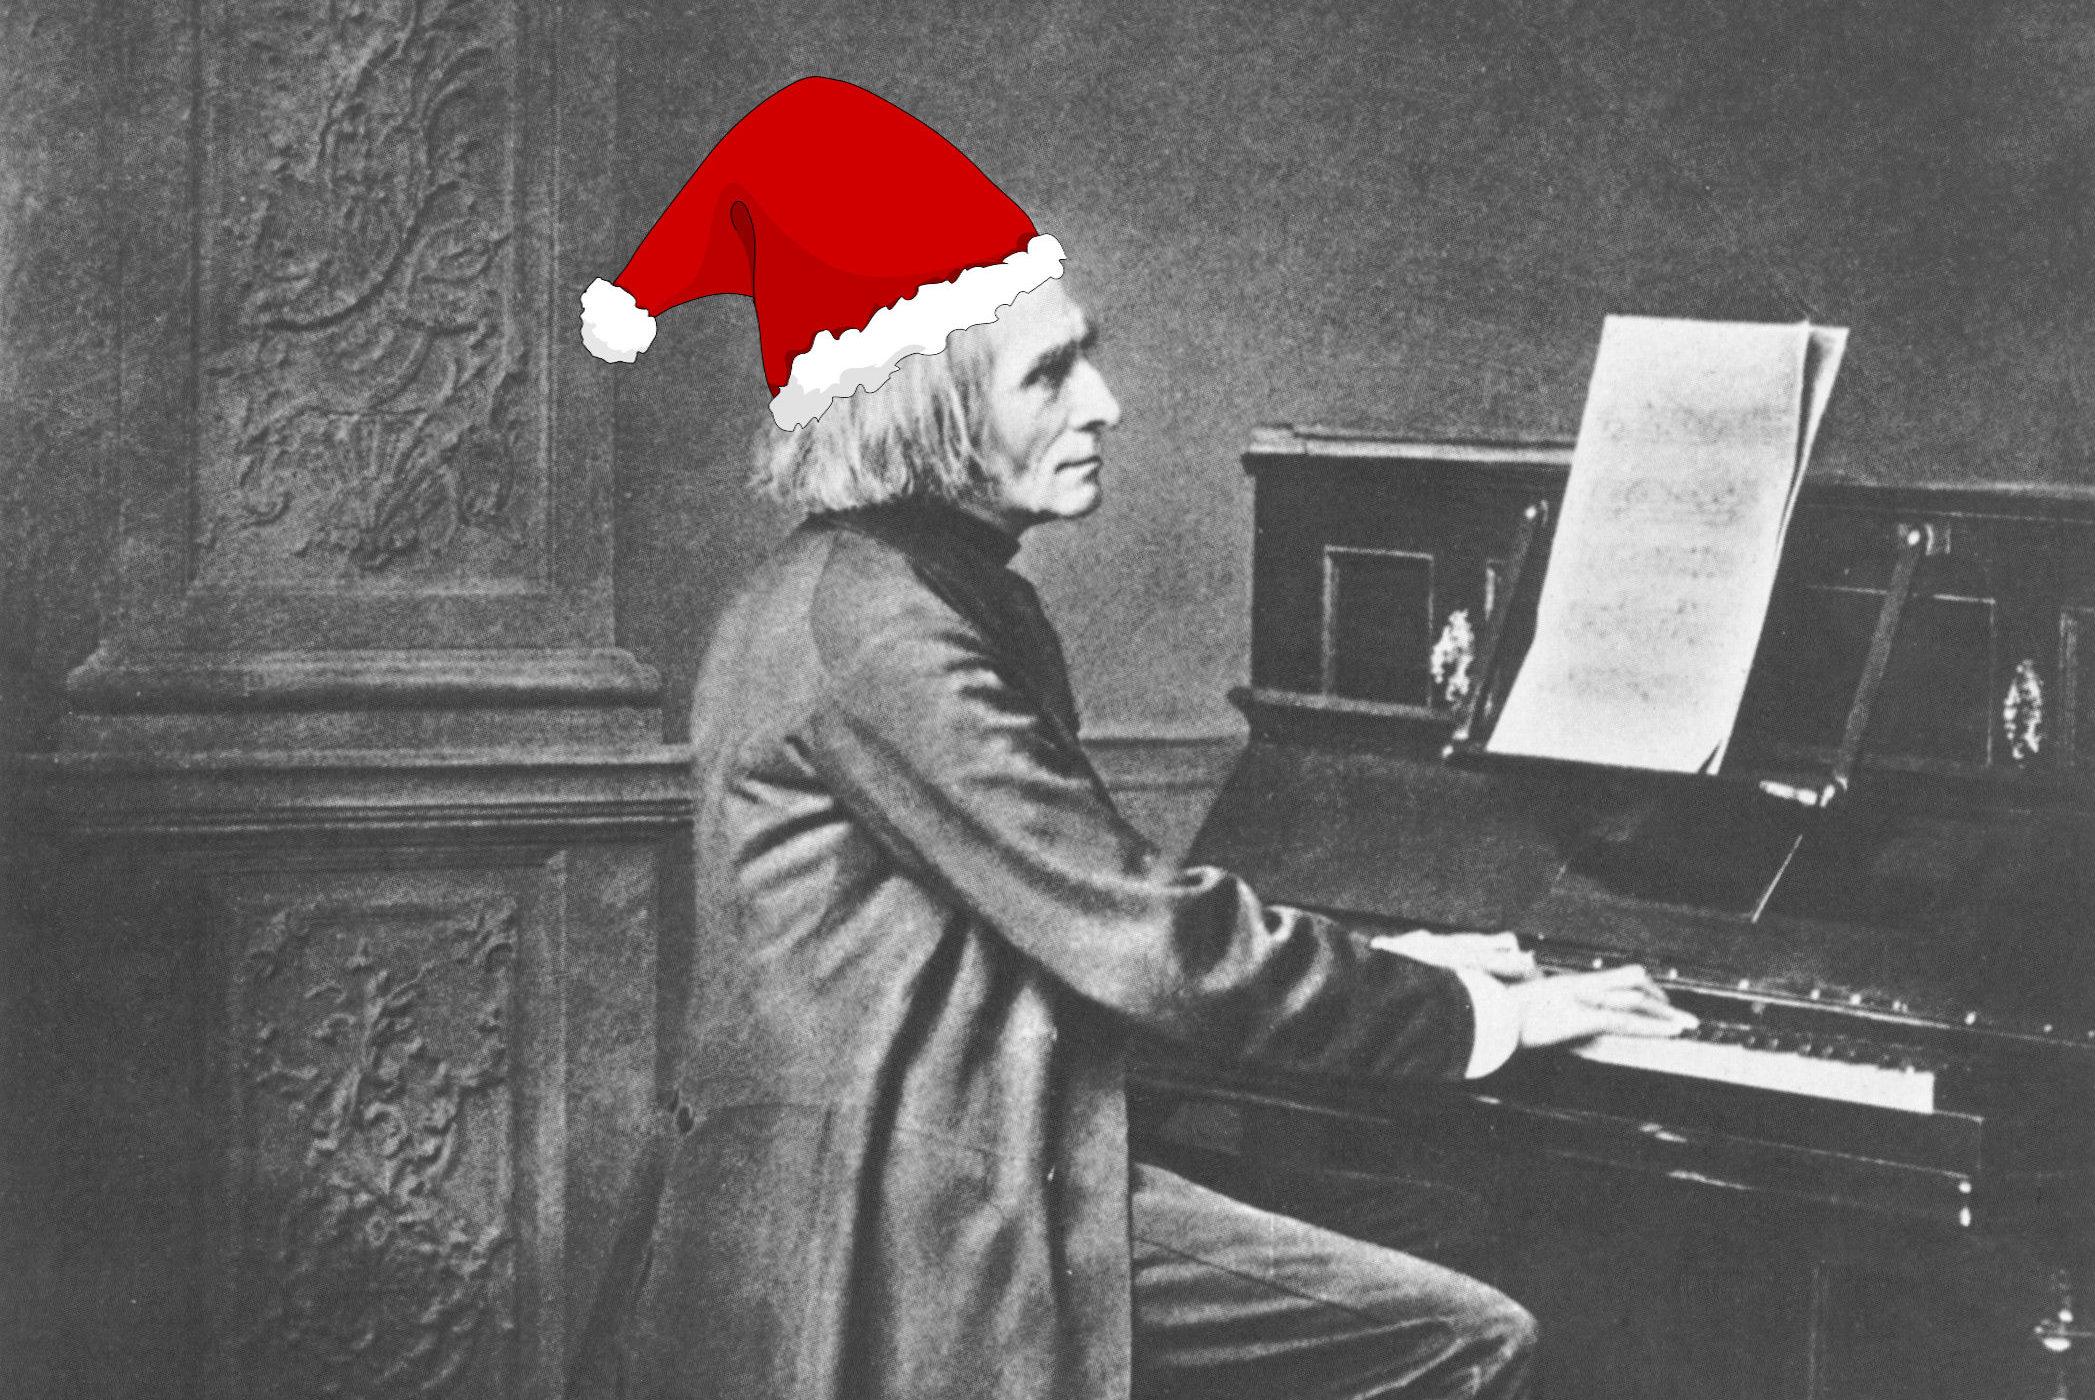 Festive Franz